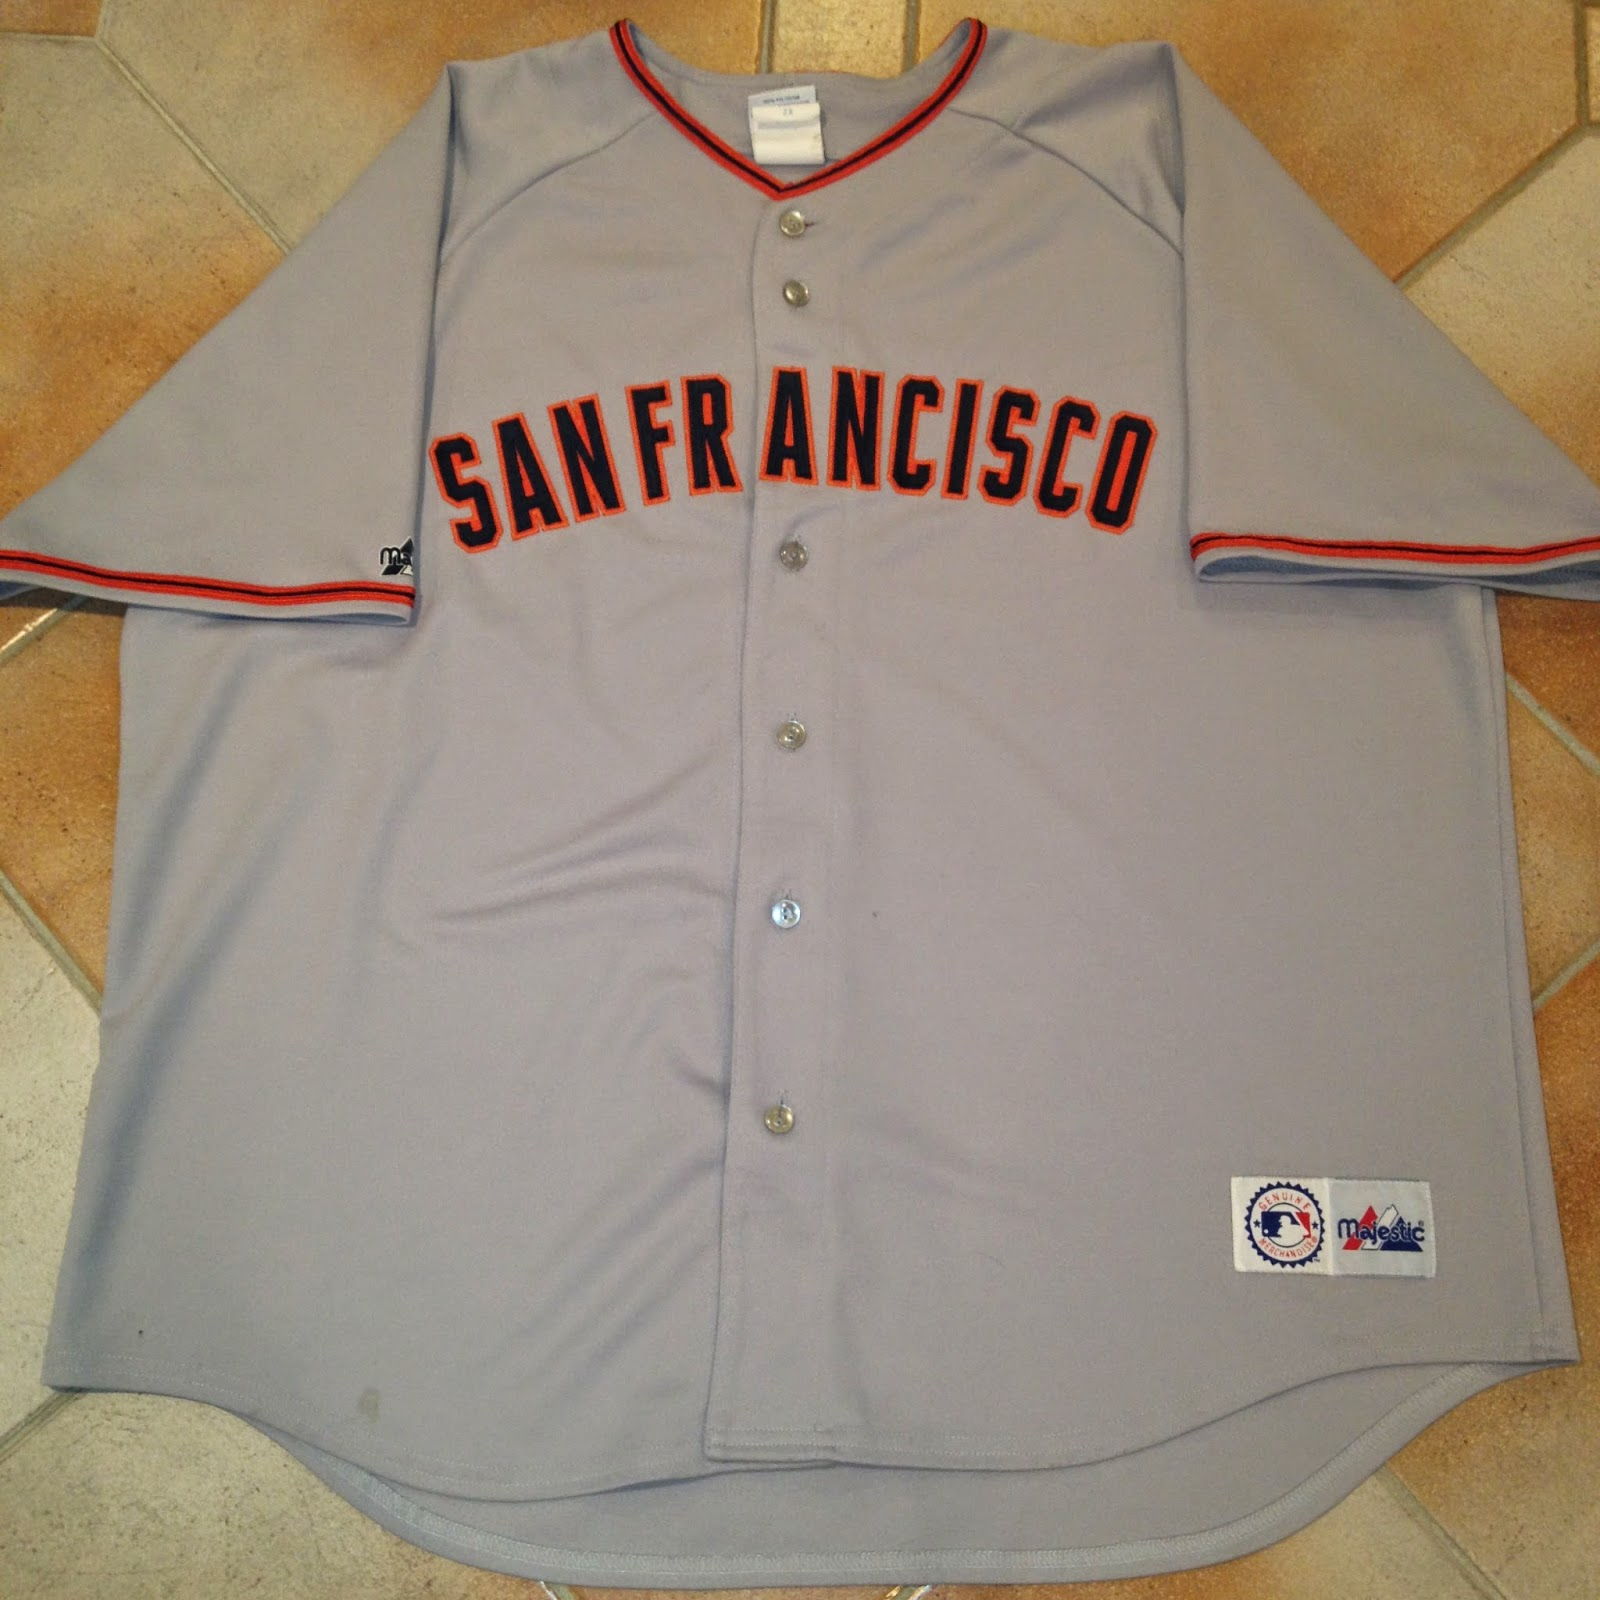 online store b723c f2953 Virgil's Blog: San Francisco Giants x Willie Mays [1961-1969]